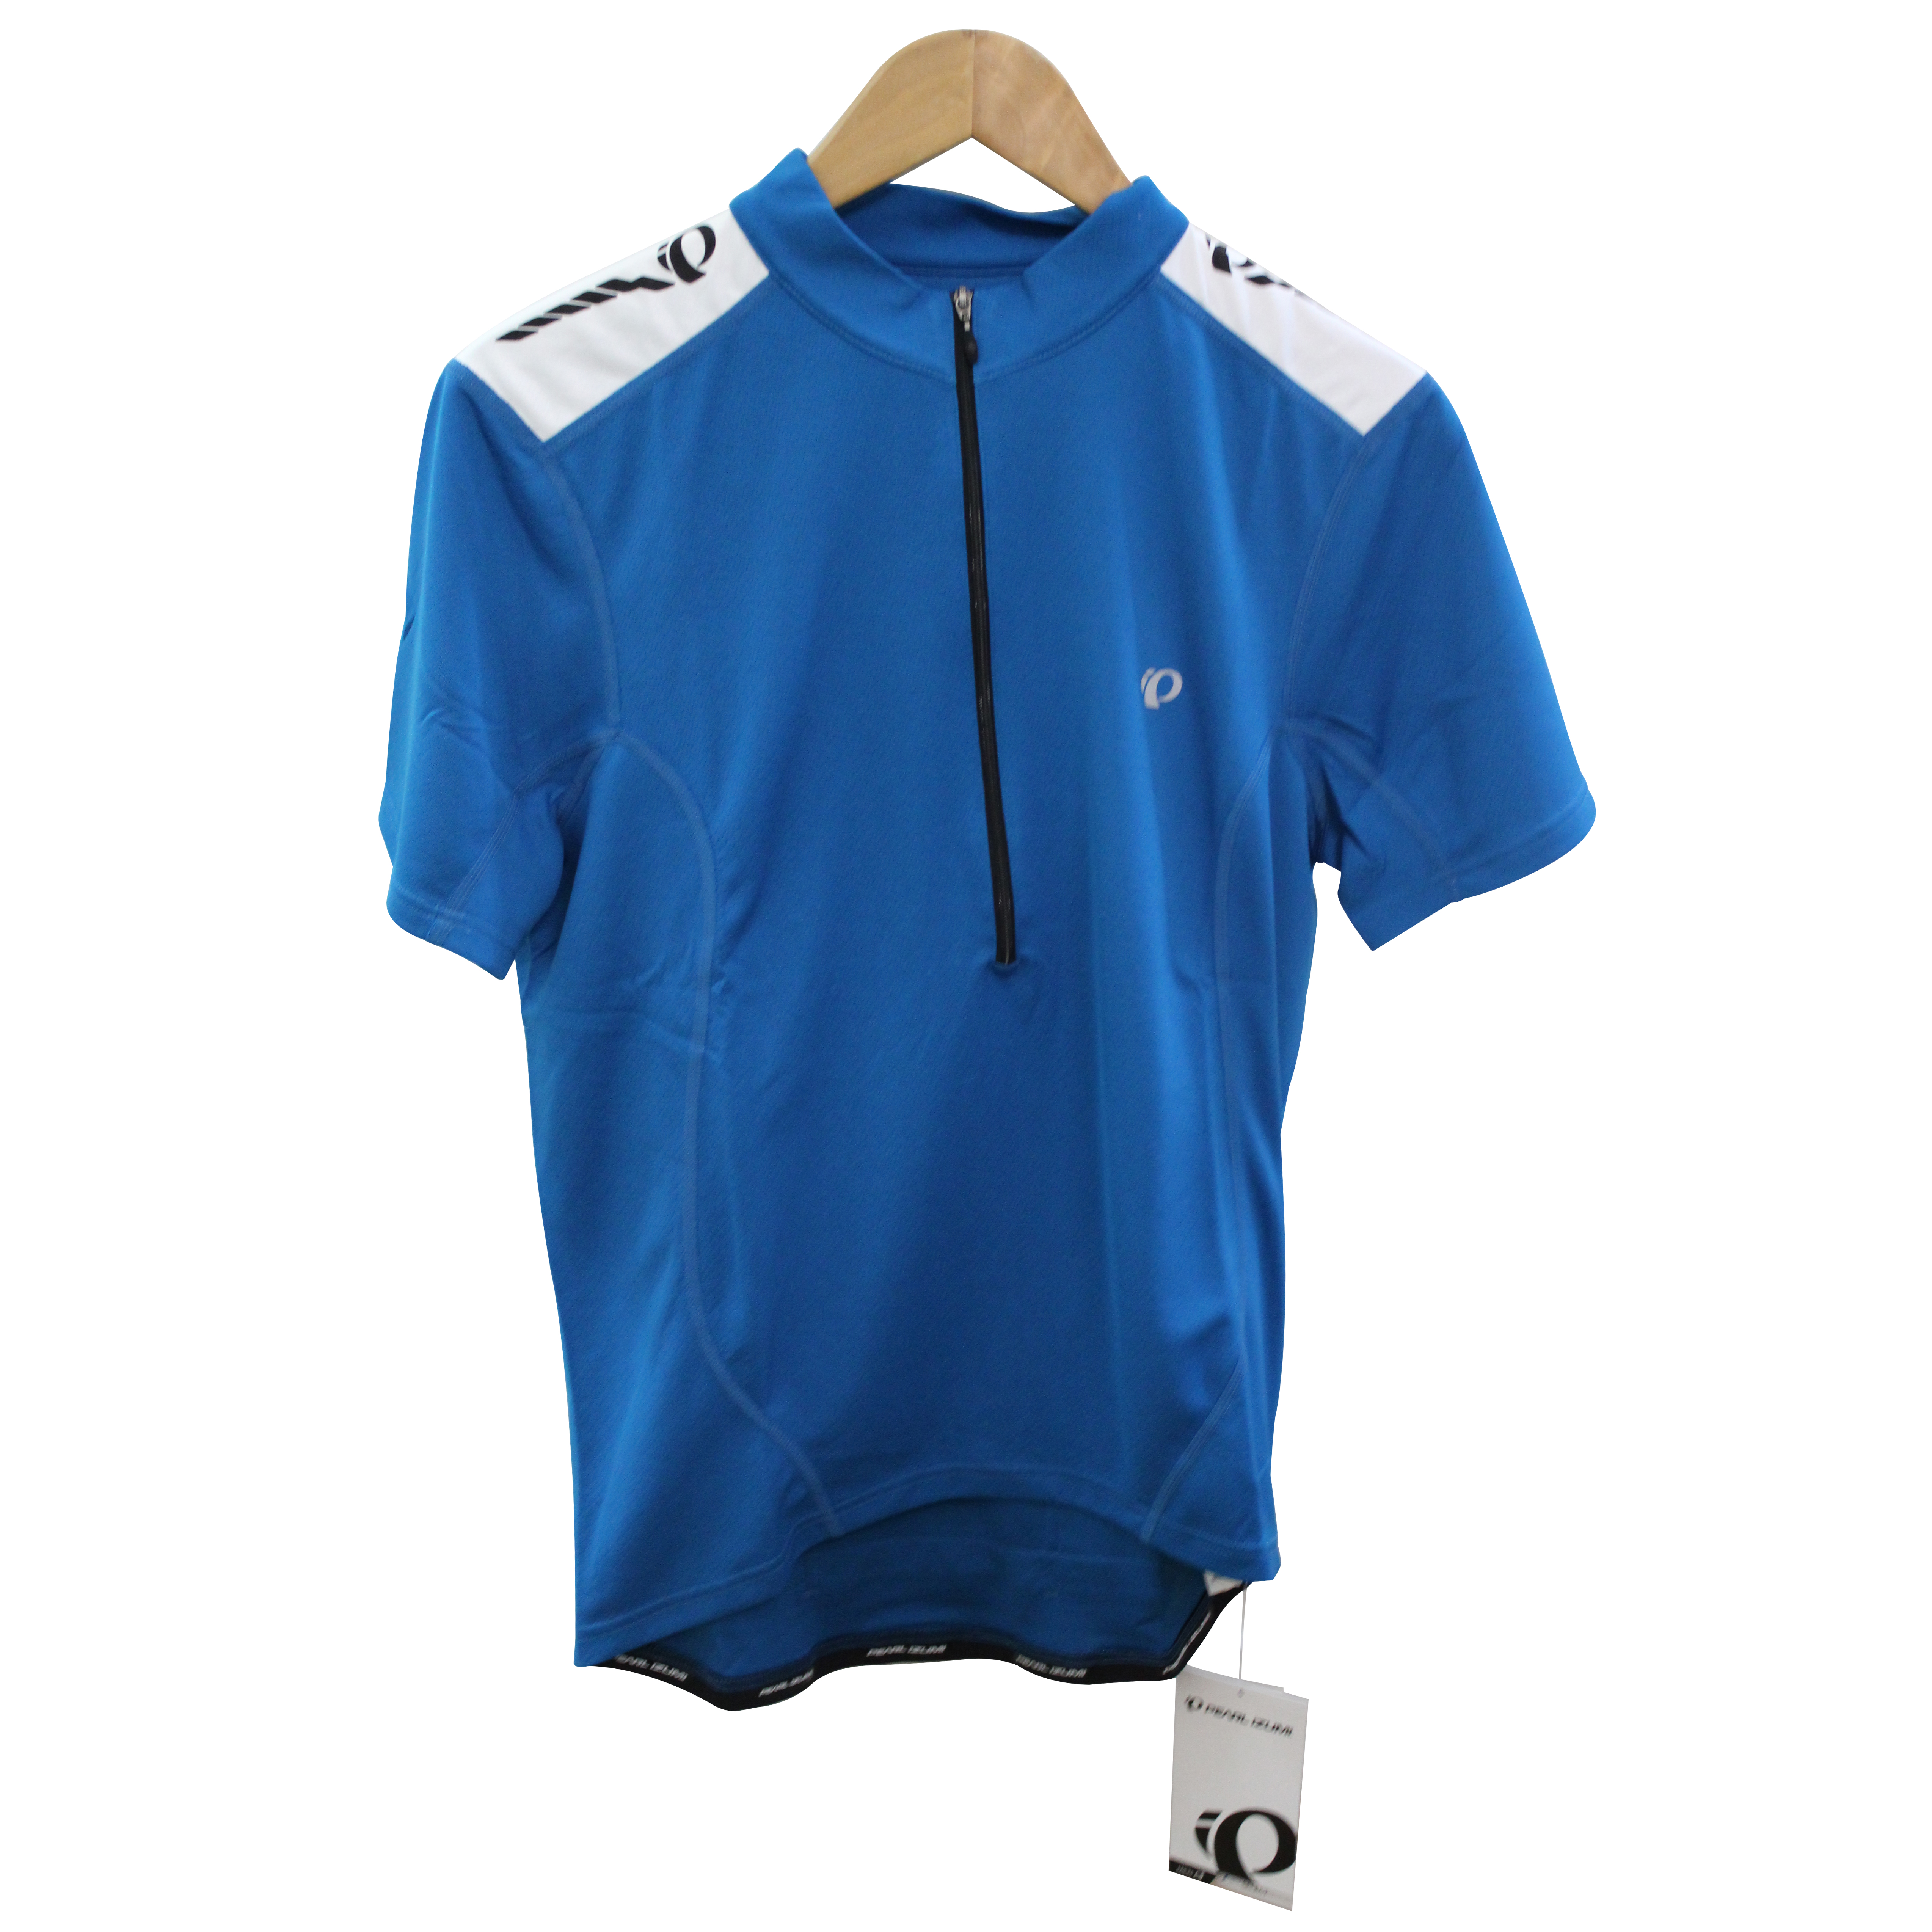 Pearl Izumi Cycling Gear Men s Jersey QUEST Blue Top M Bike Bicycle ... 553aa63d8